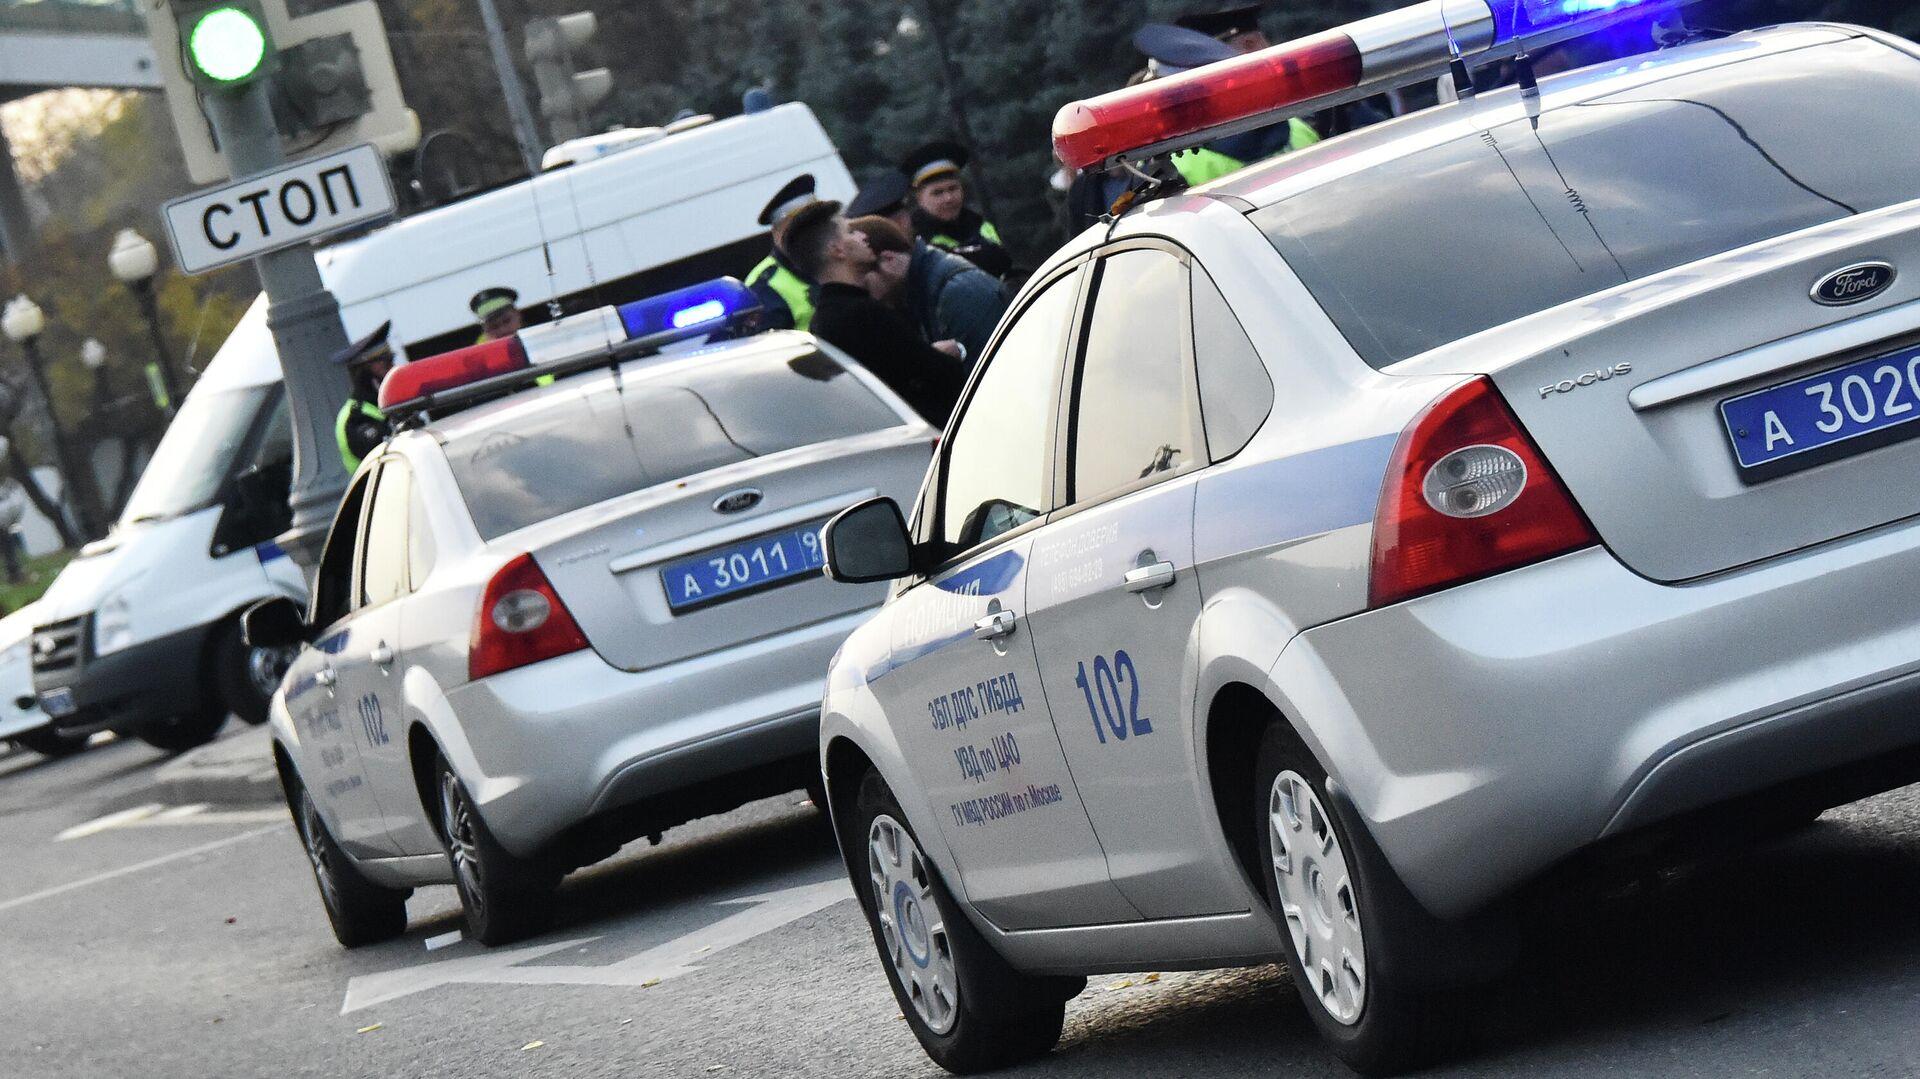 Автомобили полиции  - РИА Новости, 1920, 26.12.2019